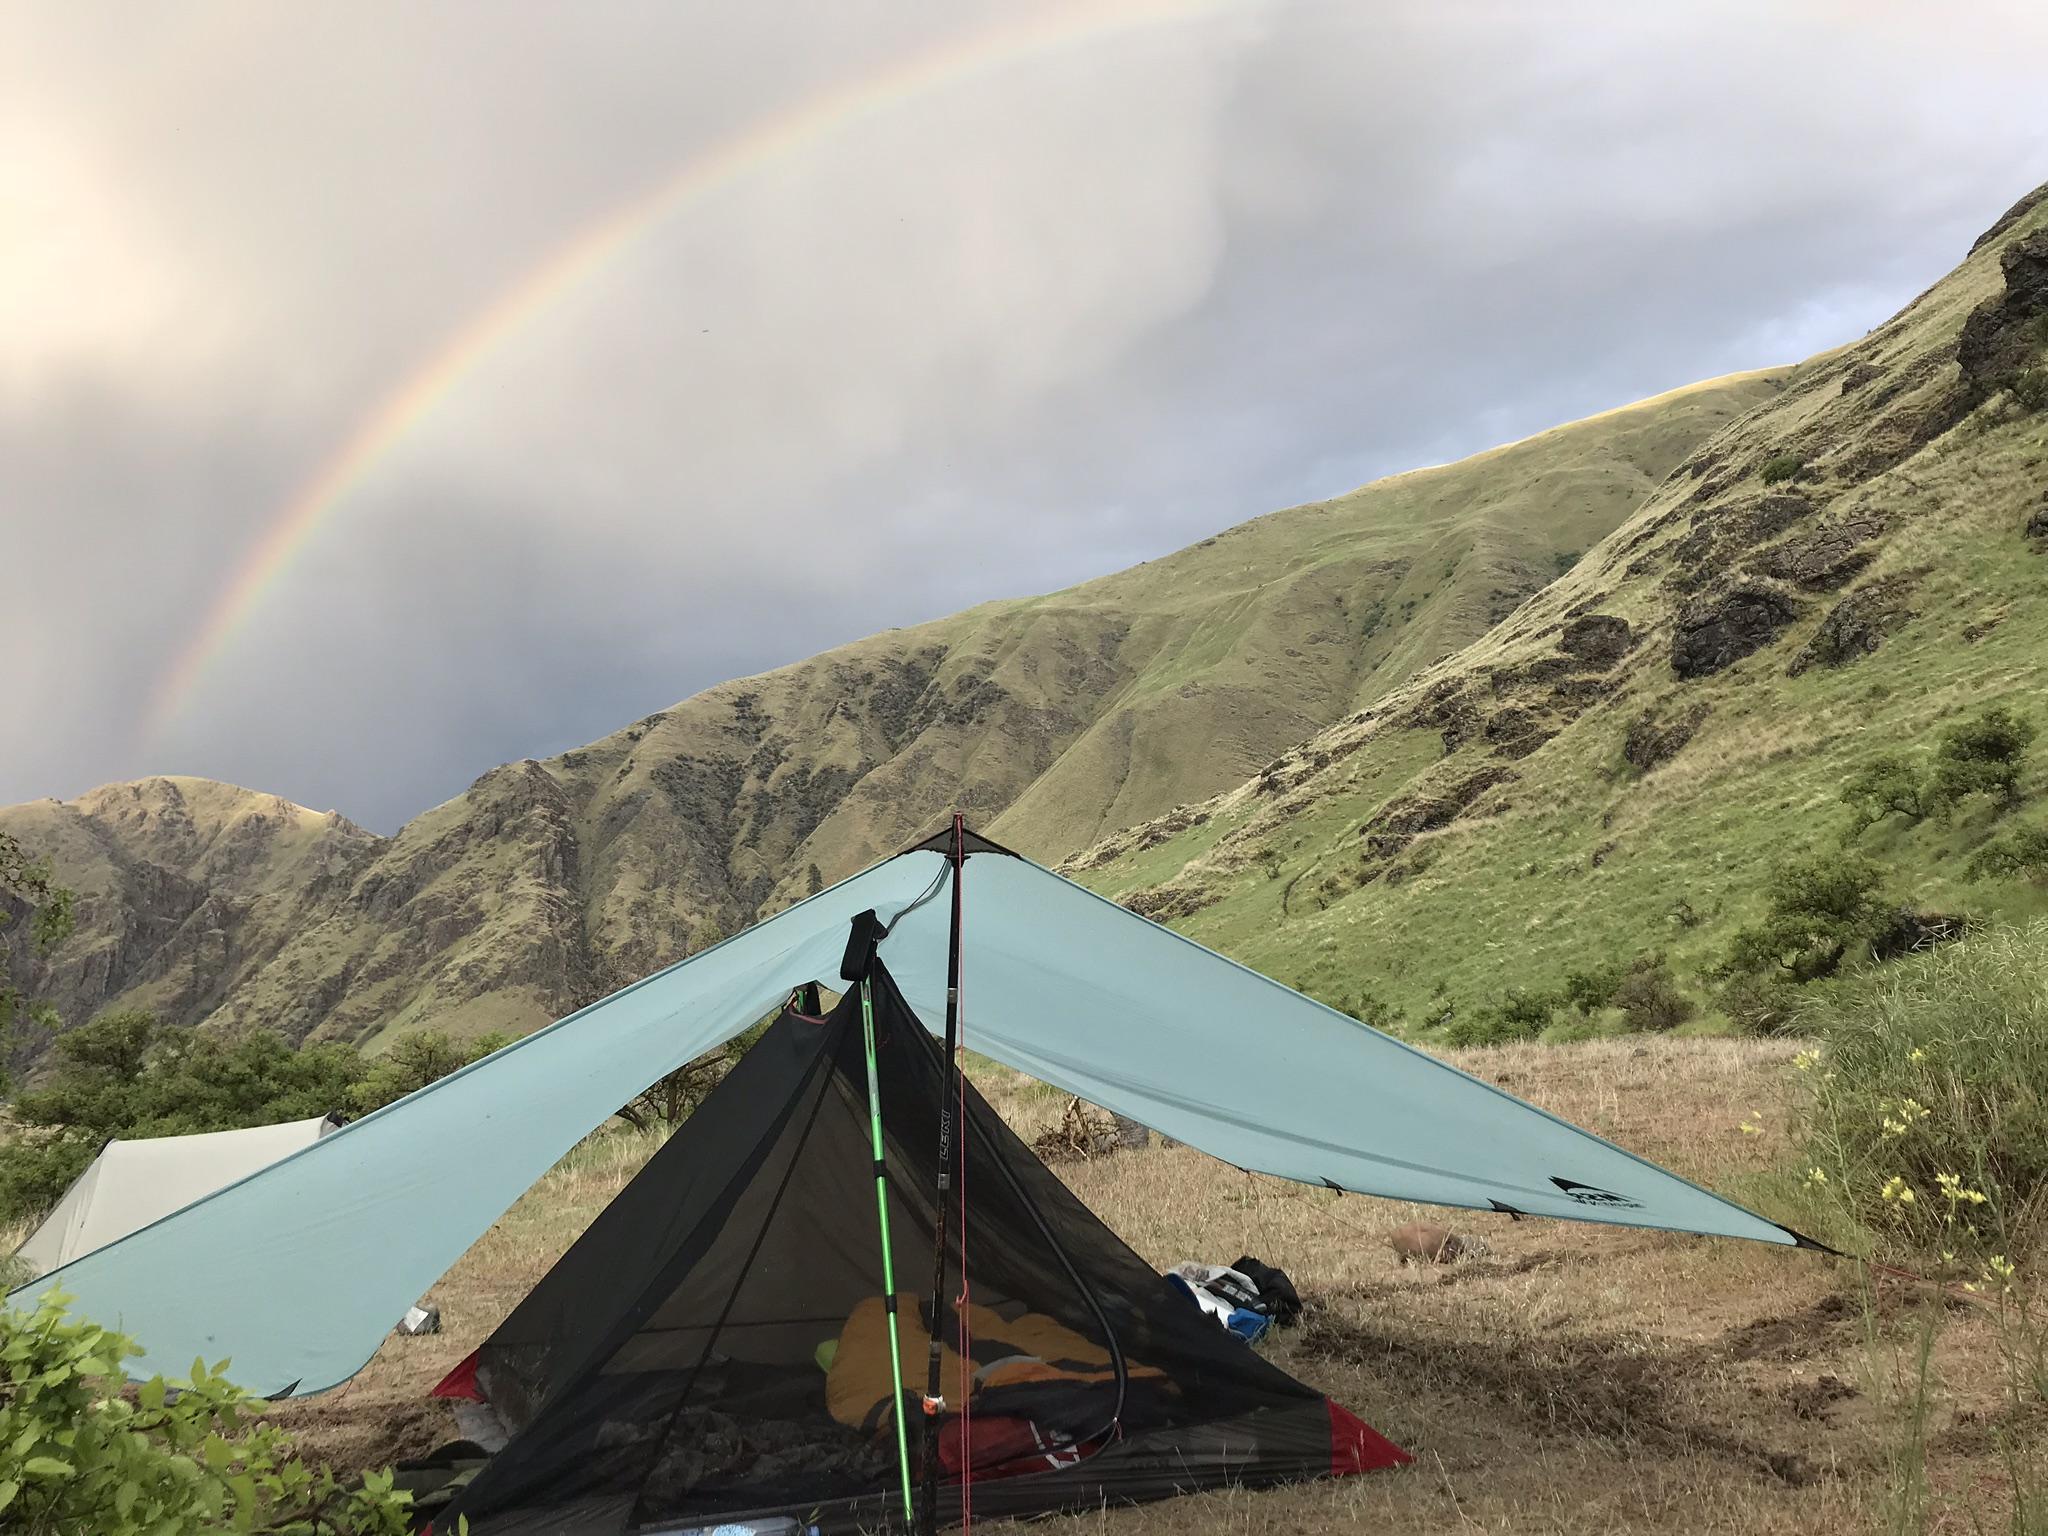 MSR Thru-Hiker Mesh House 3 Trekking Pole Shelter and Thru-Hiker 100 Wing Shelter